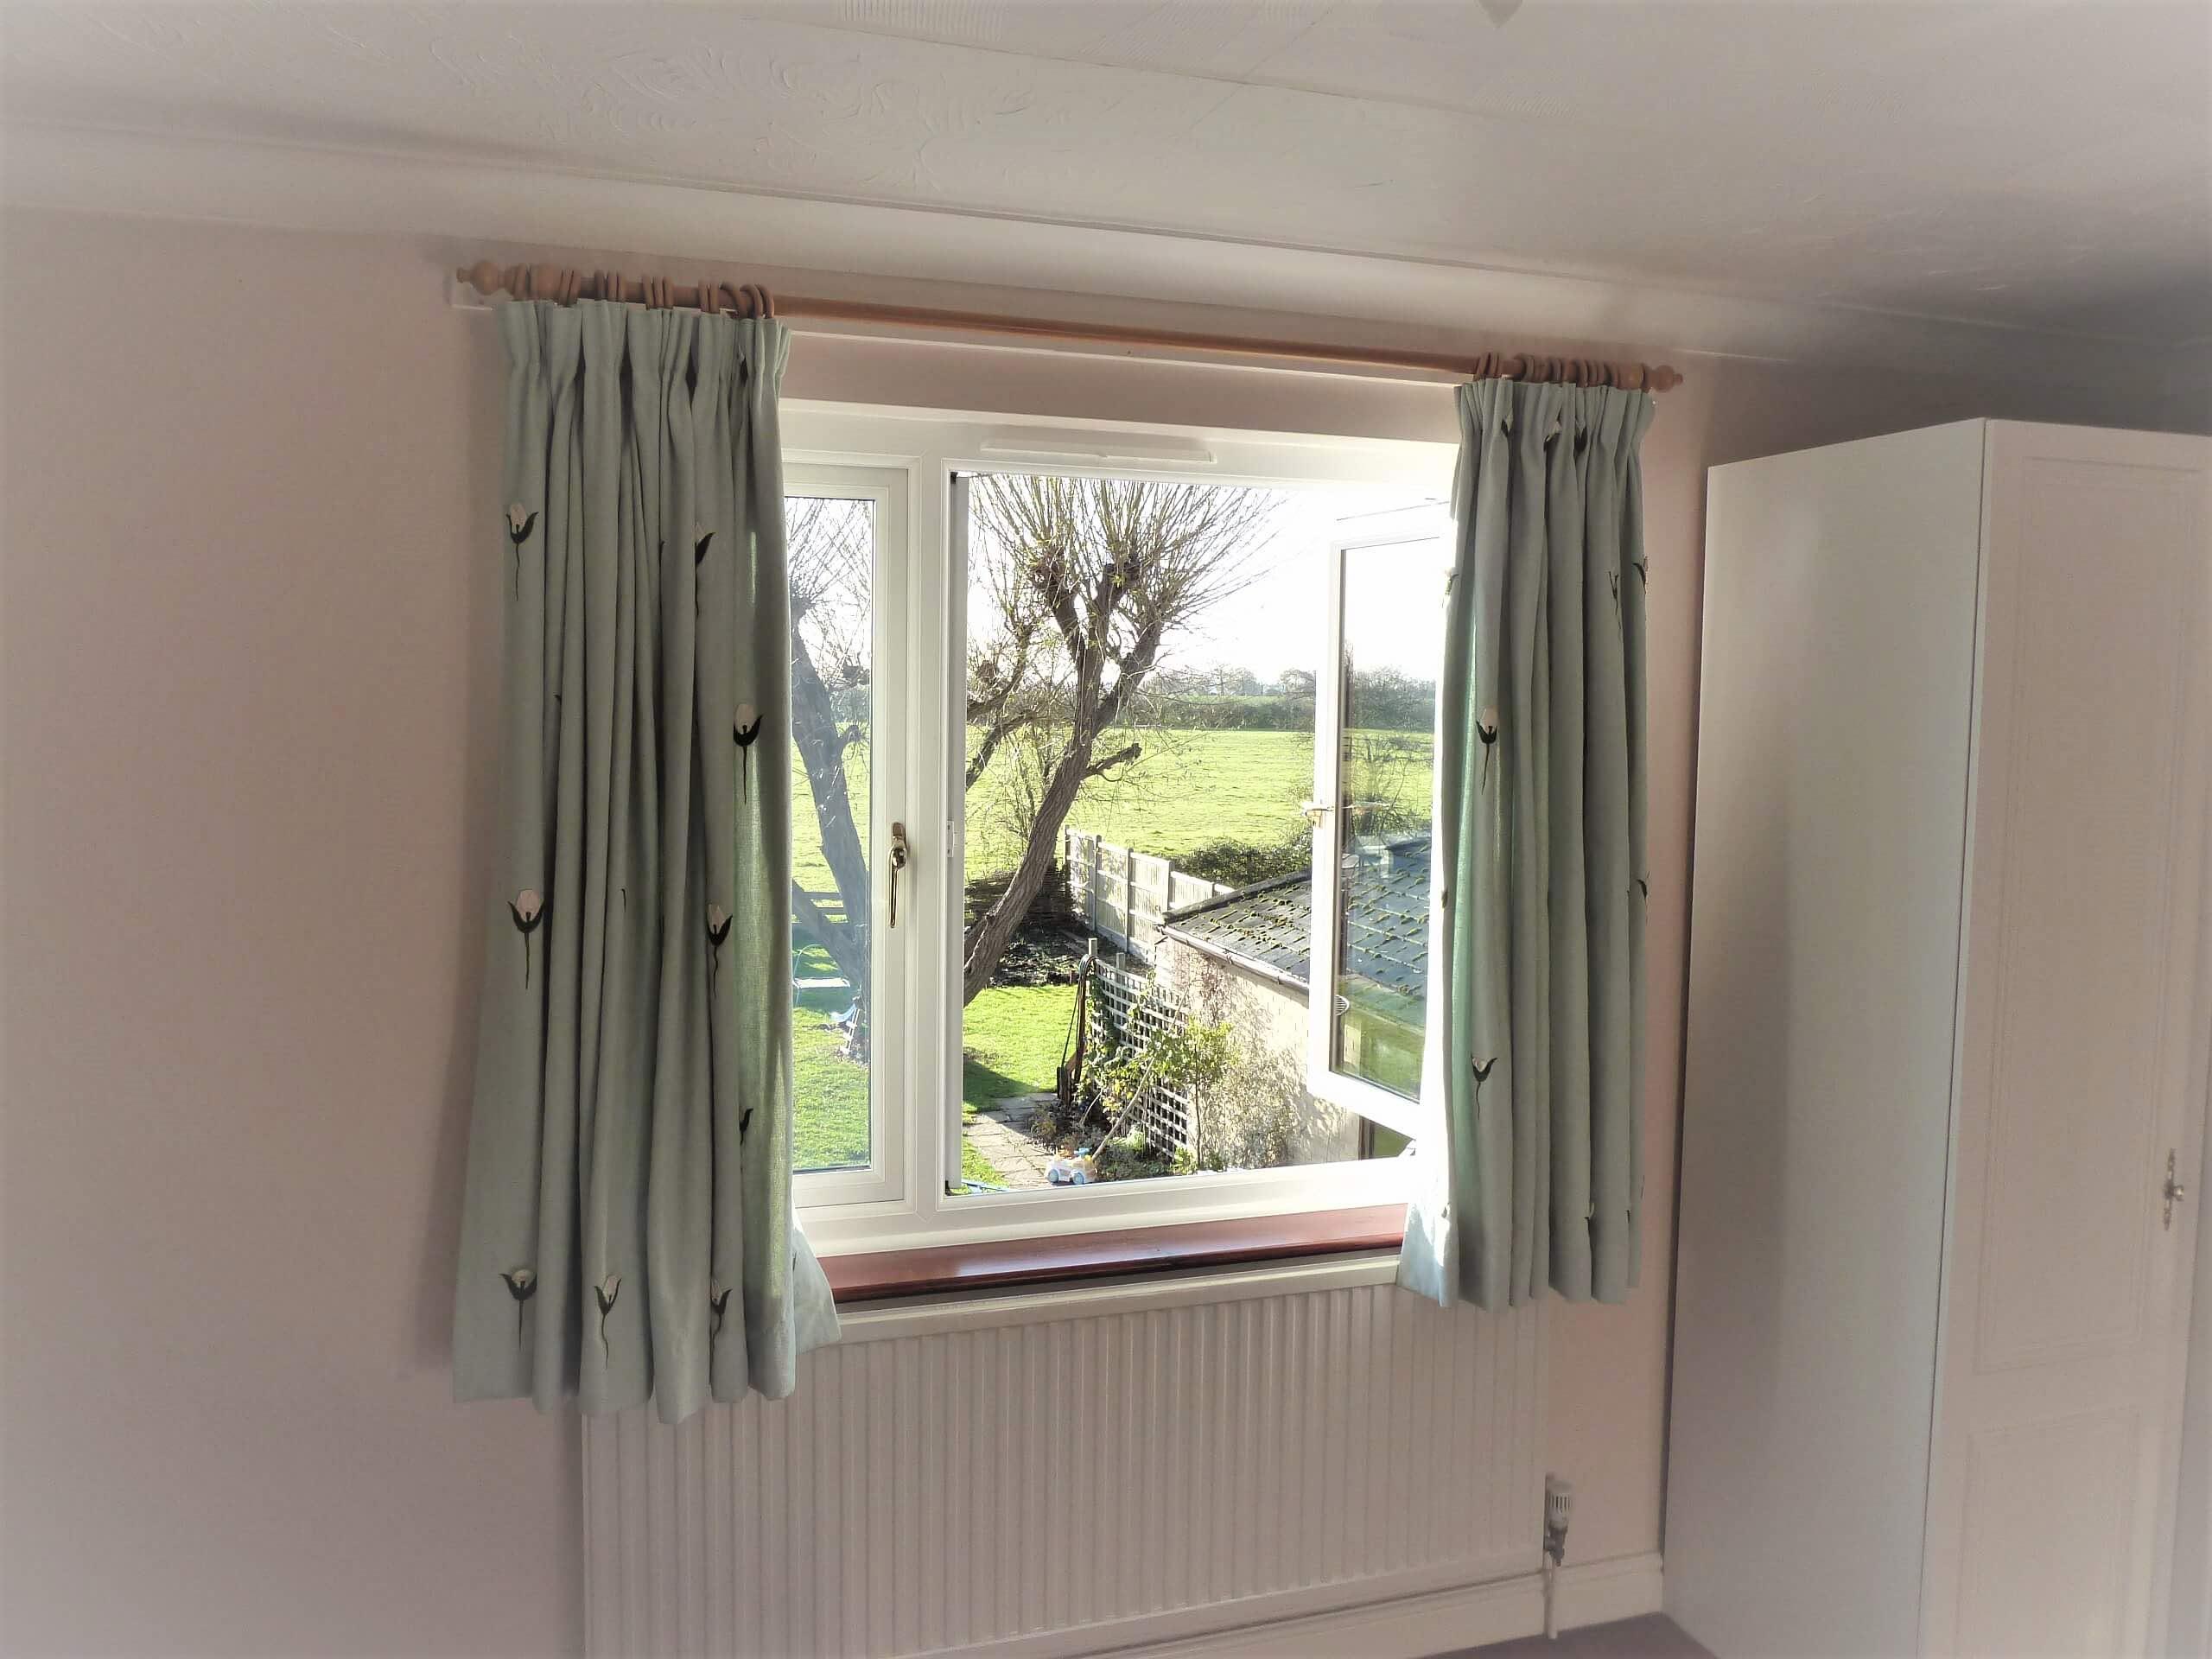 2. French Casement Windows